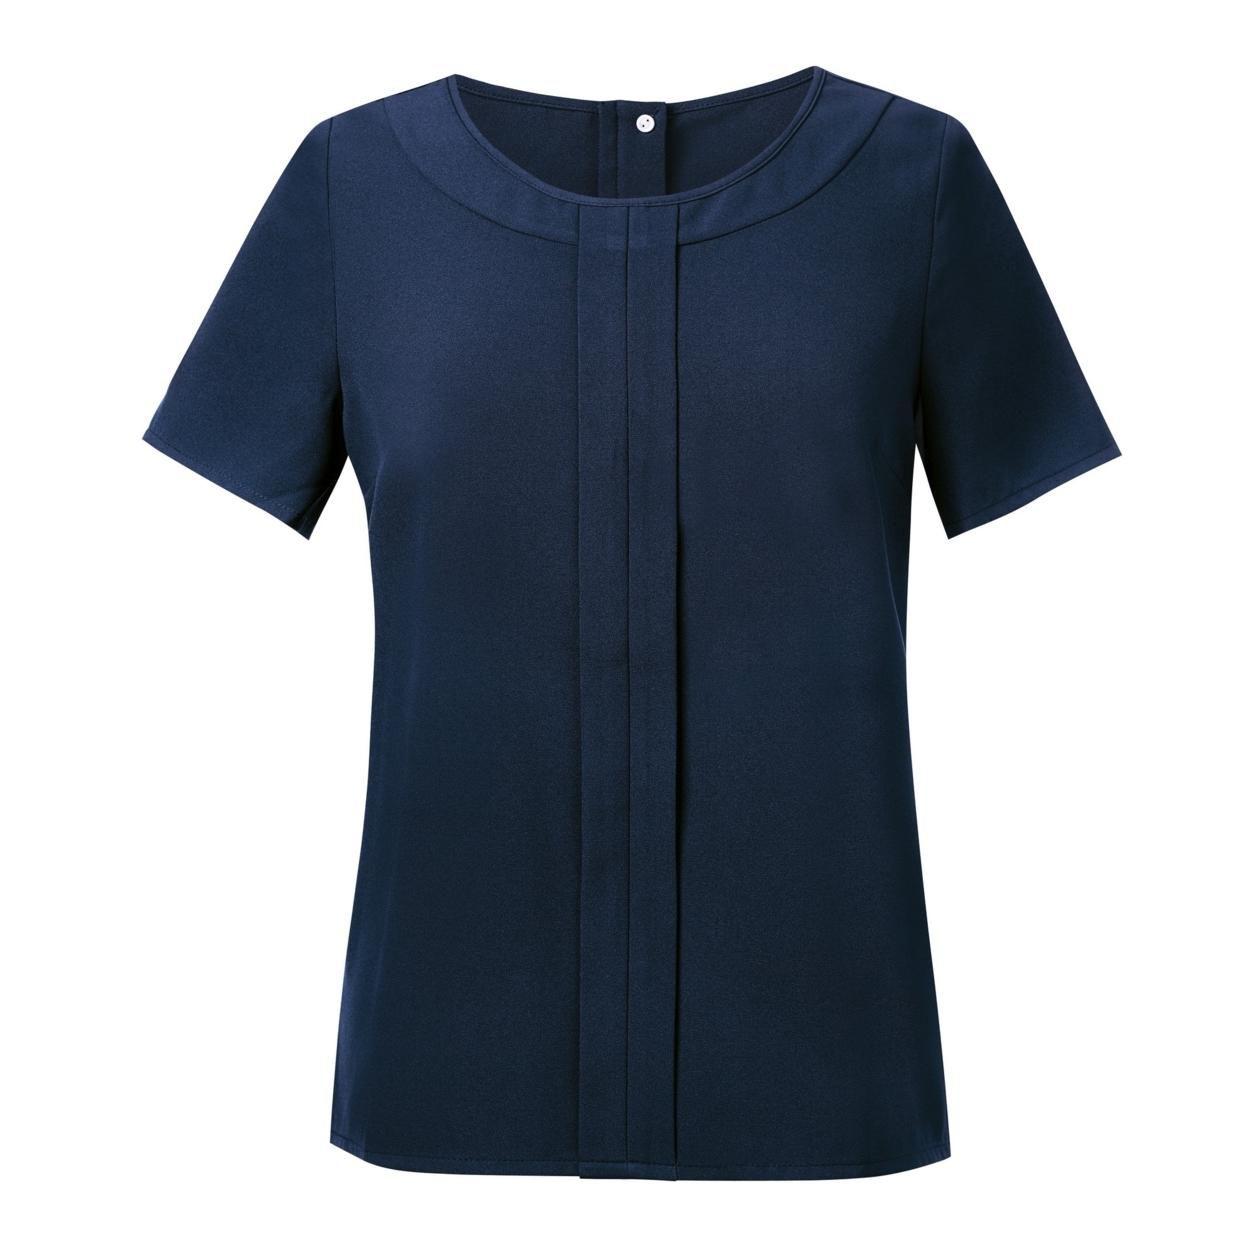 Brook Taverner Womens/Ladies Verona Crepe De Chine Short Sleeved Blouse Size 10